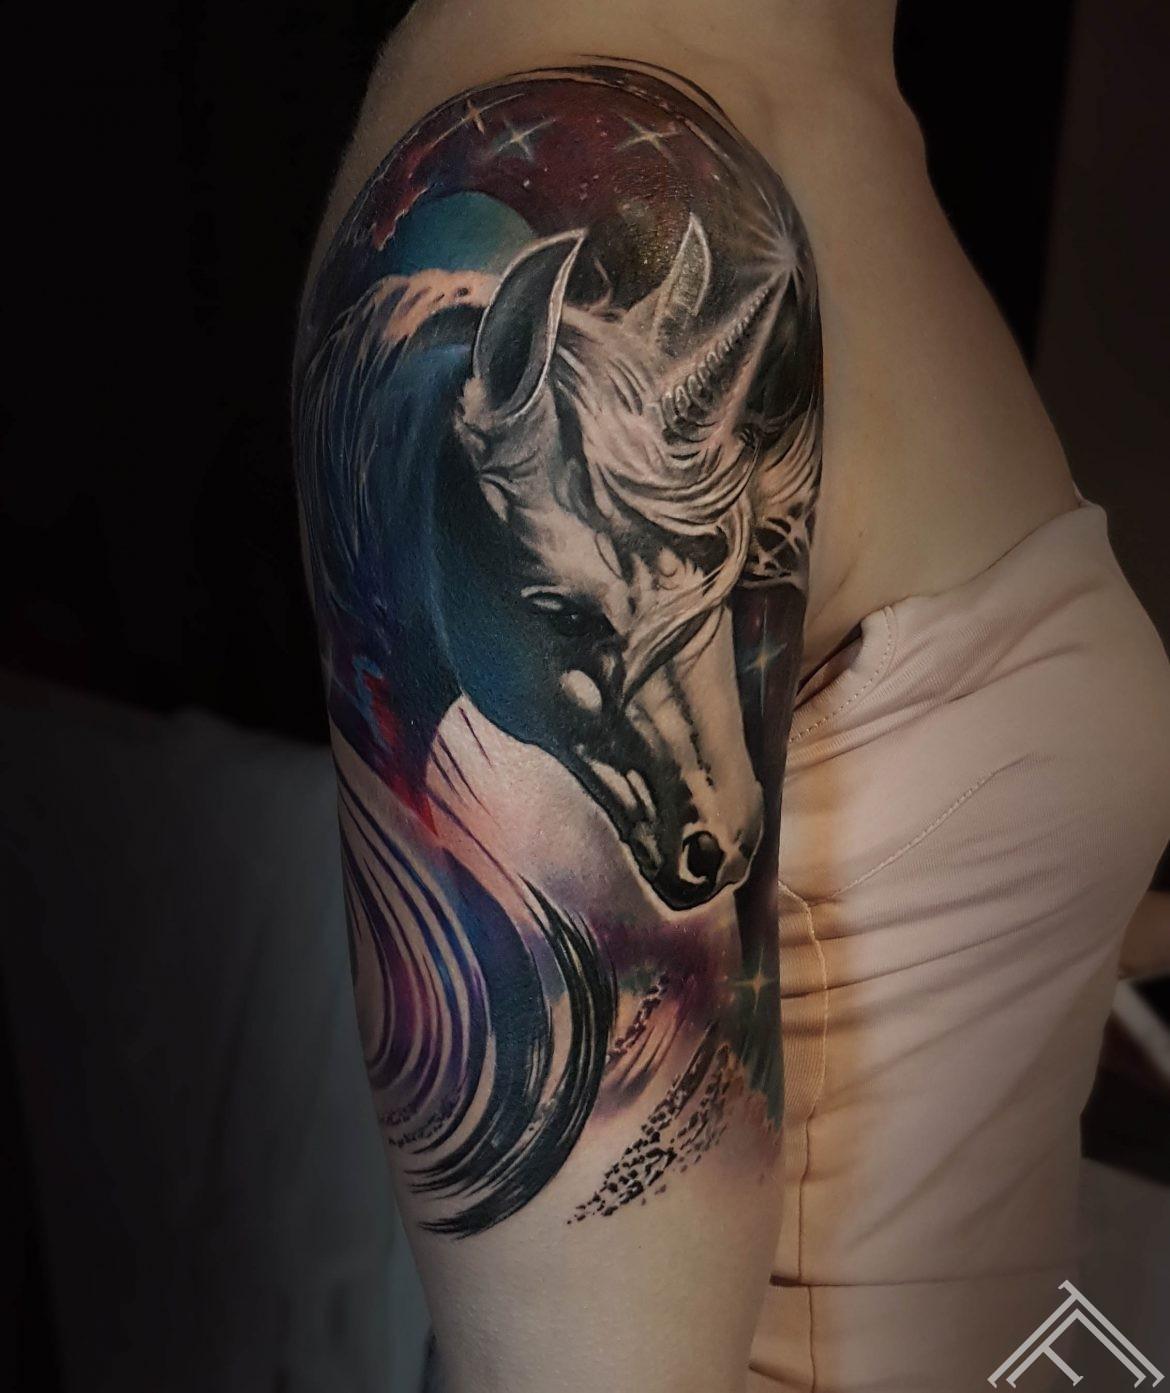 unicorn-pegas-tattoo-zirgs-tattoofrequency-marispavlo-inkbash